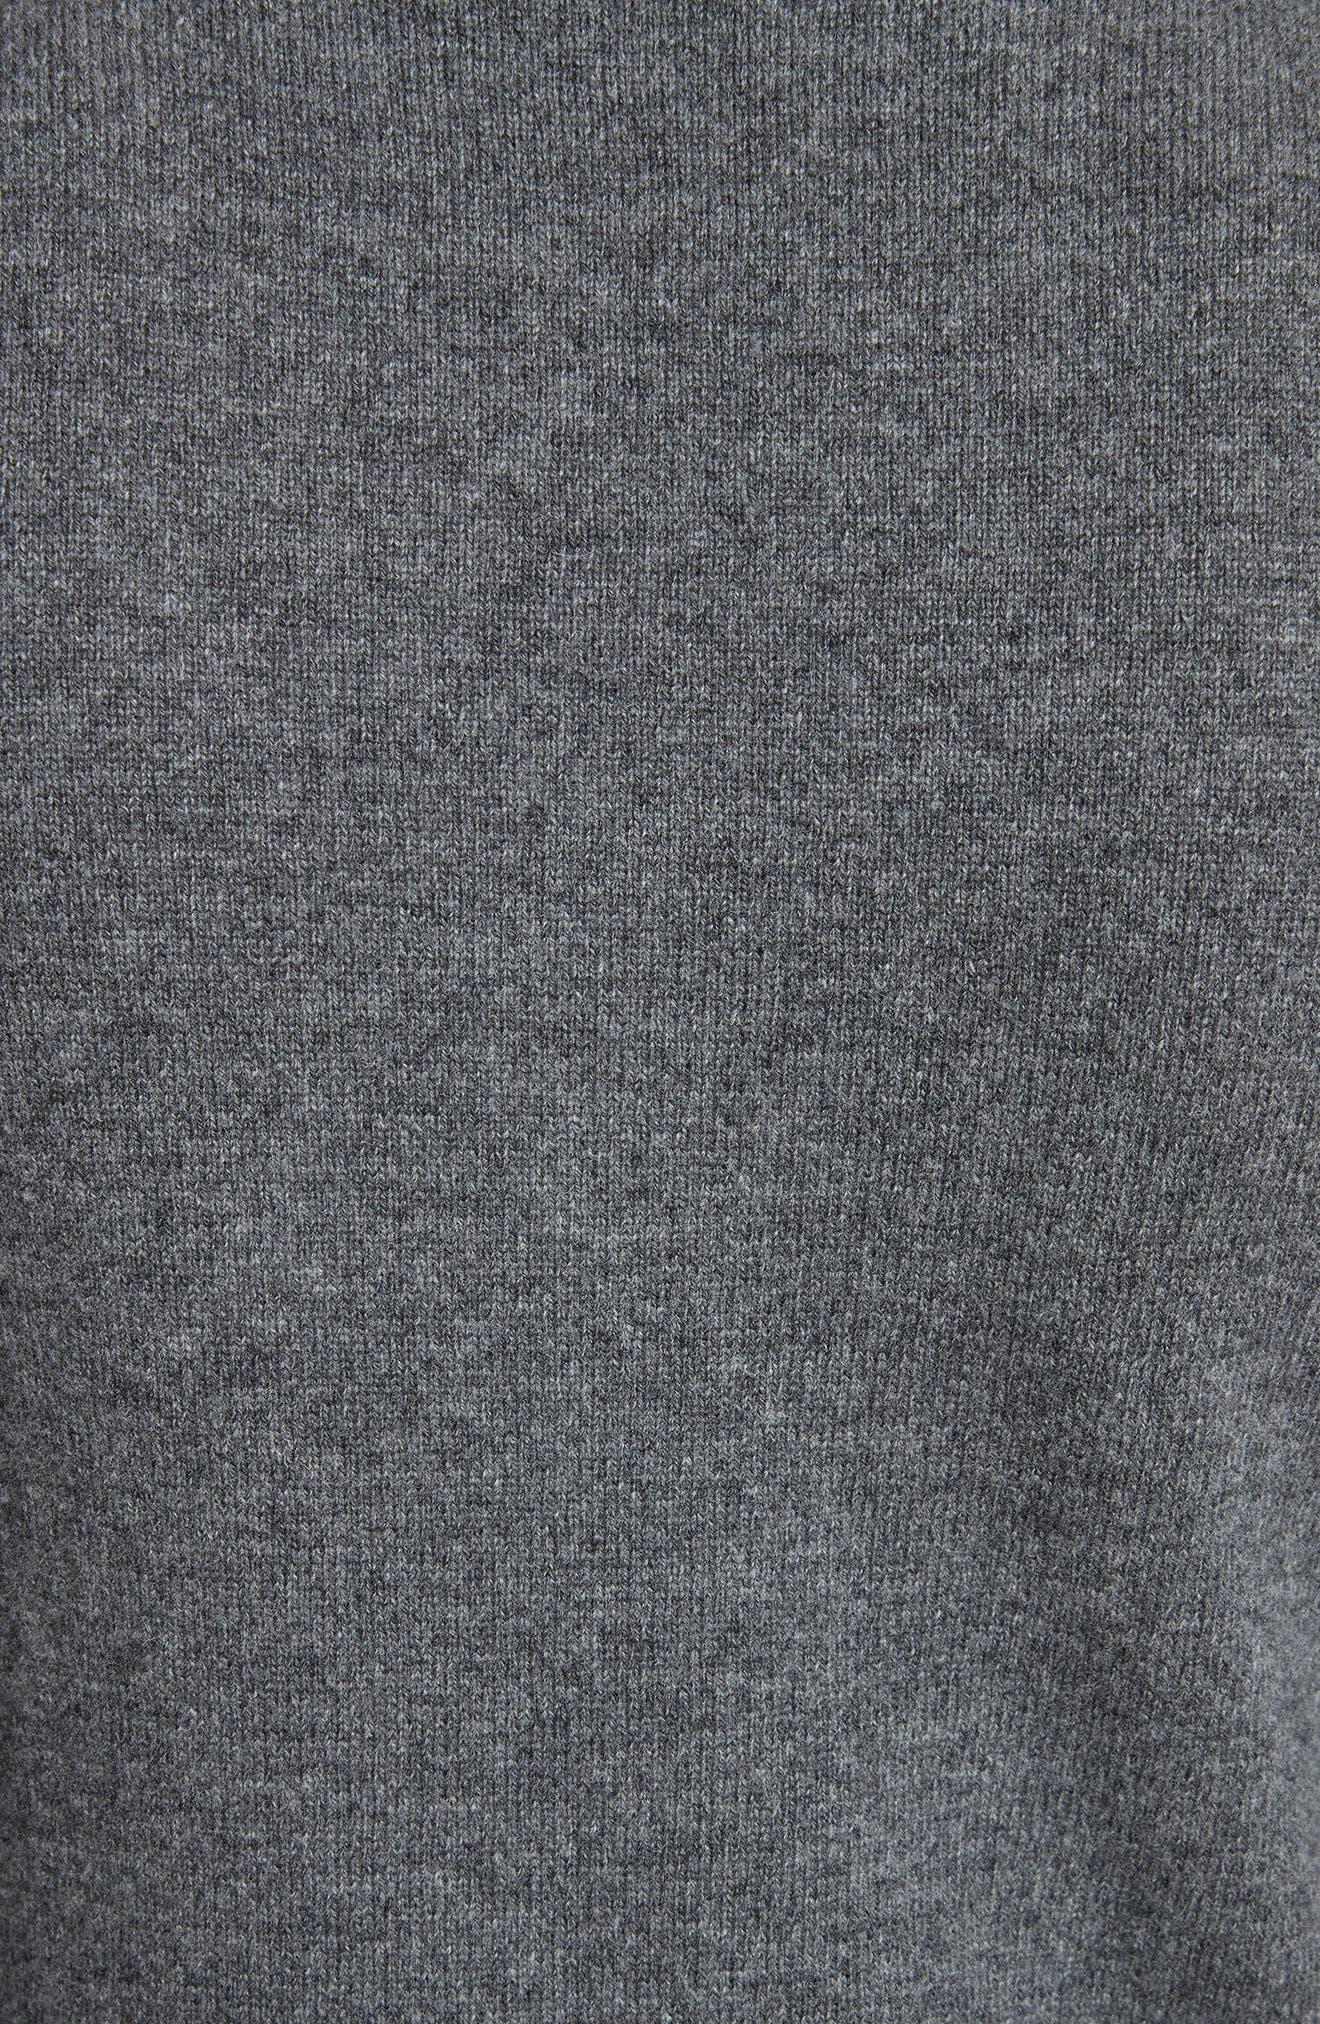 Wool V-Neck Sweater,                             Alternate thumbnail 5, color,                             GREY